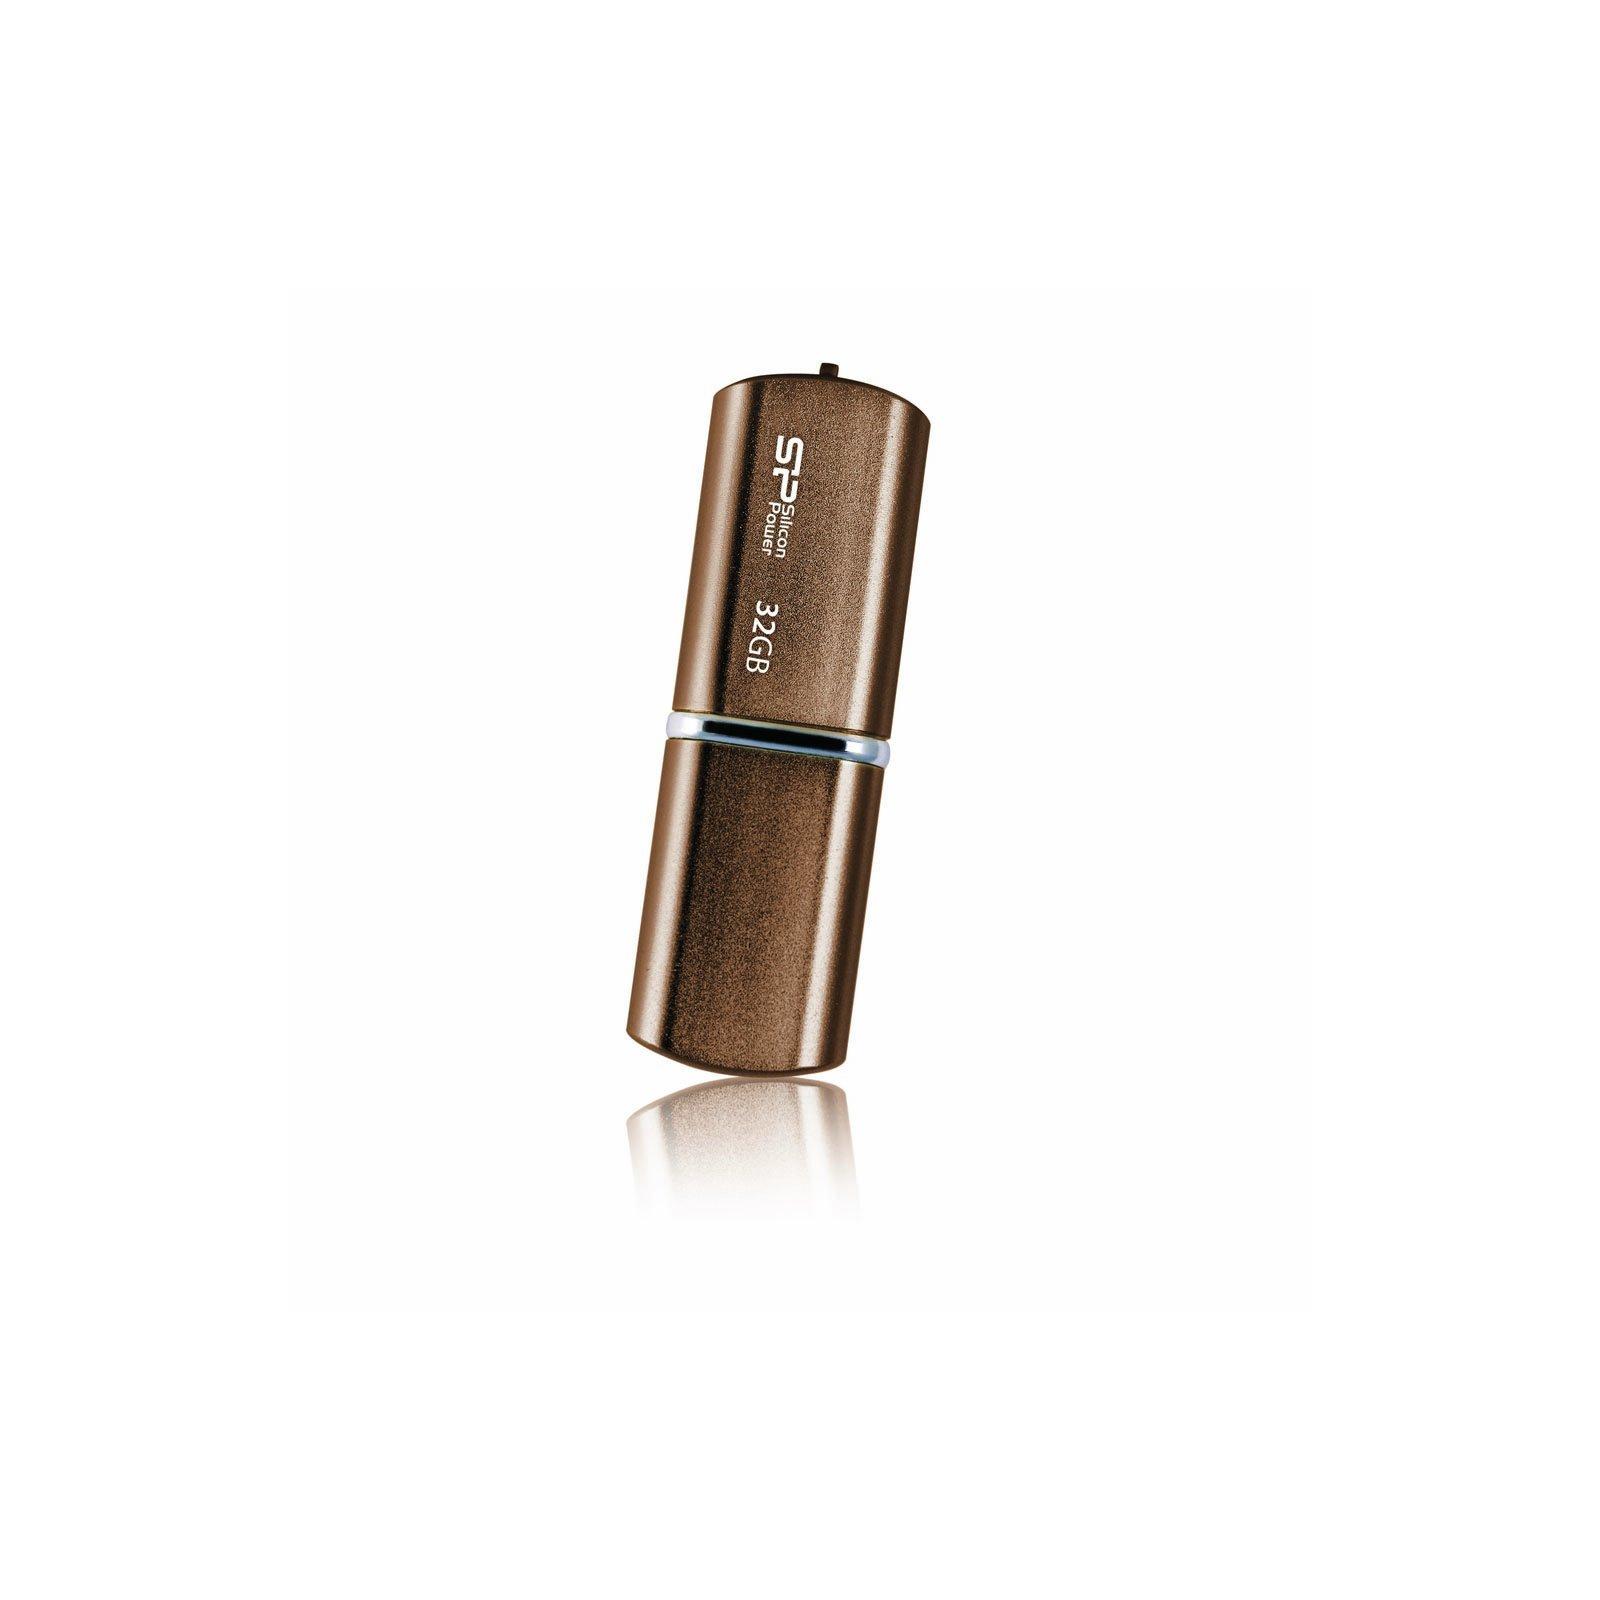 USB флеш накопитель Silicon Power 32Gb LuxMini 720 Bronze (SP032GBUF2720V1Z)